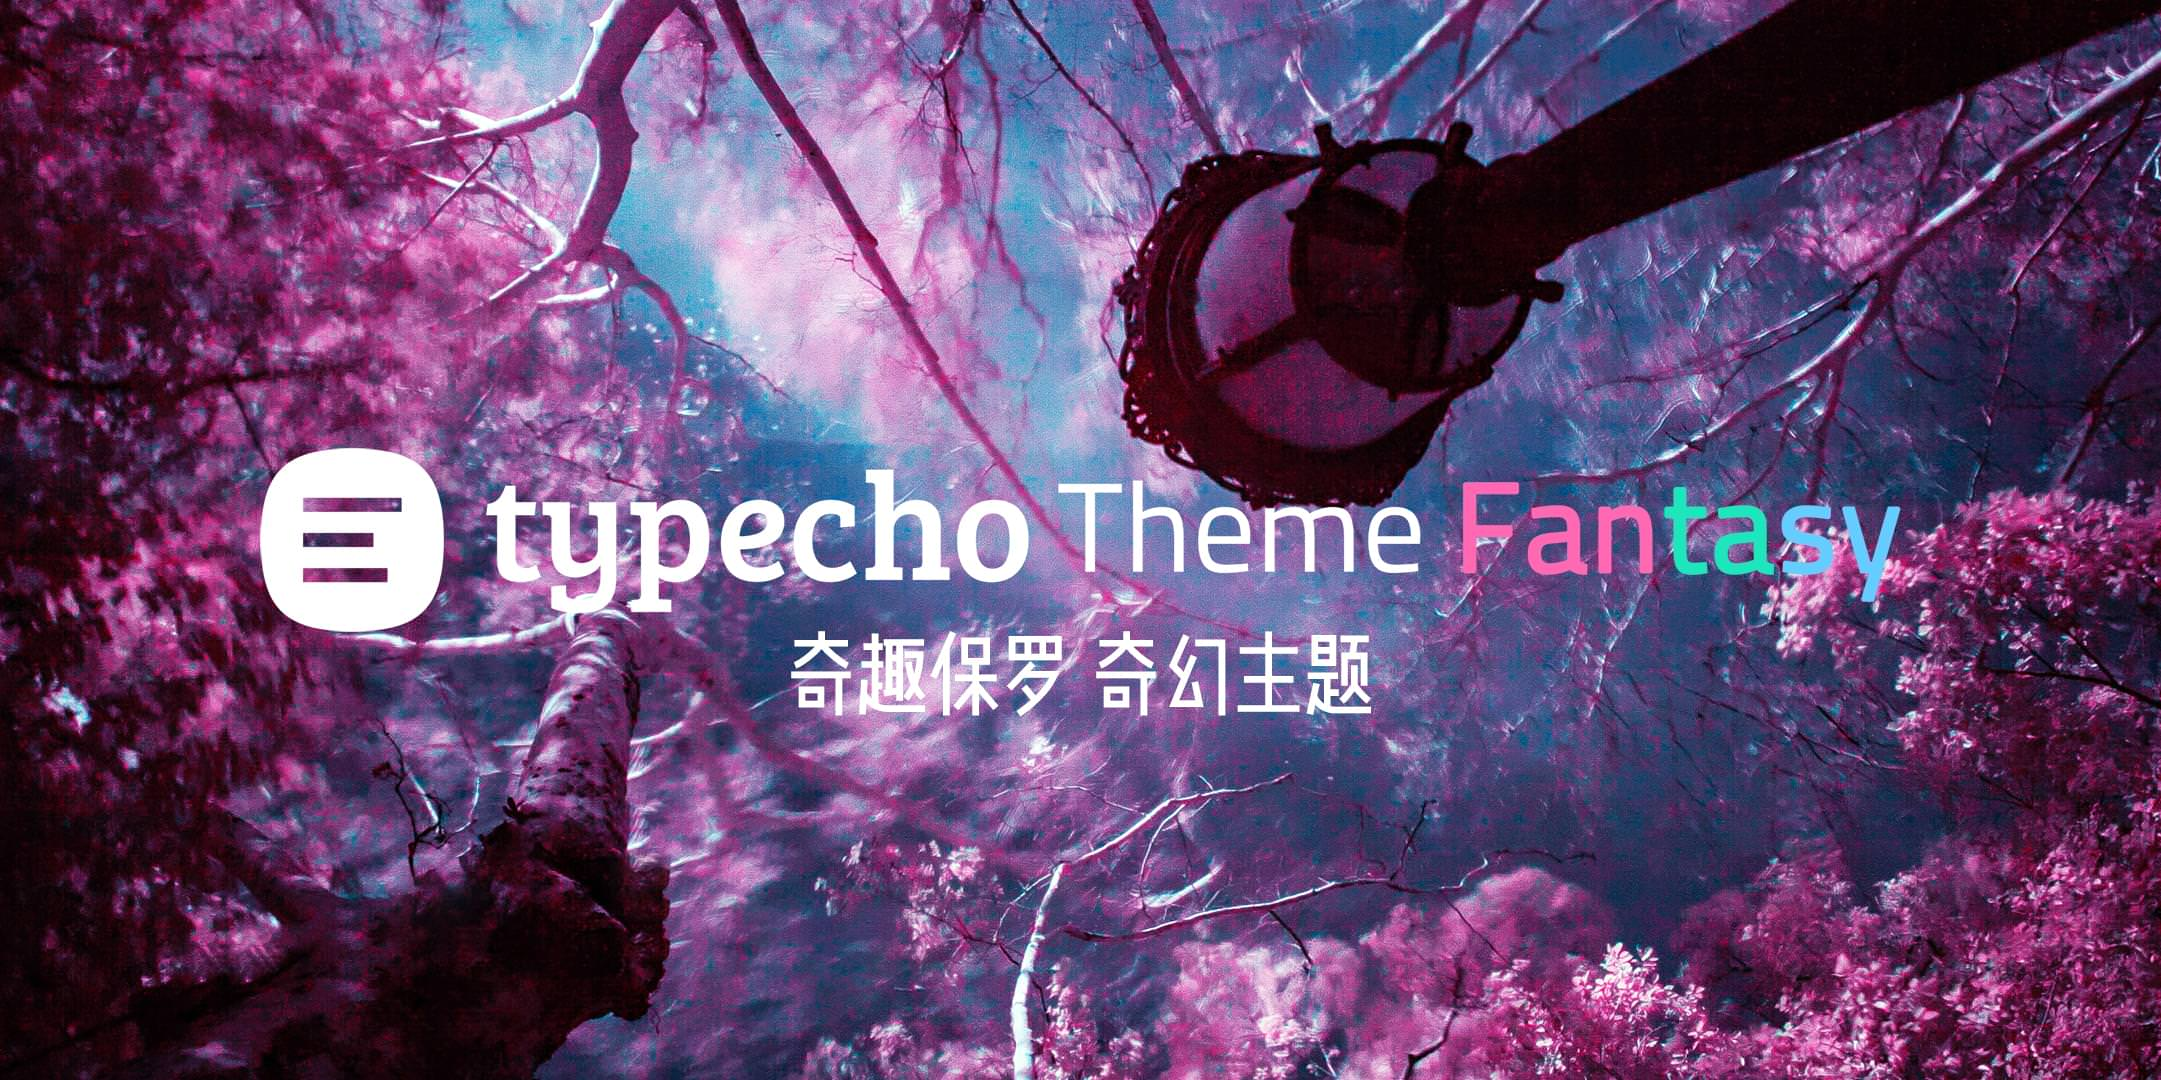 Typecho Theme Fantasy Render Poster - Web Based Version